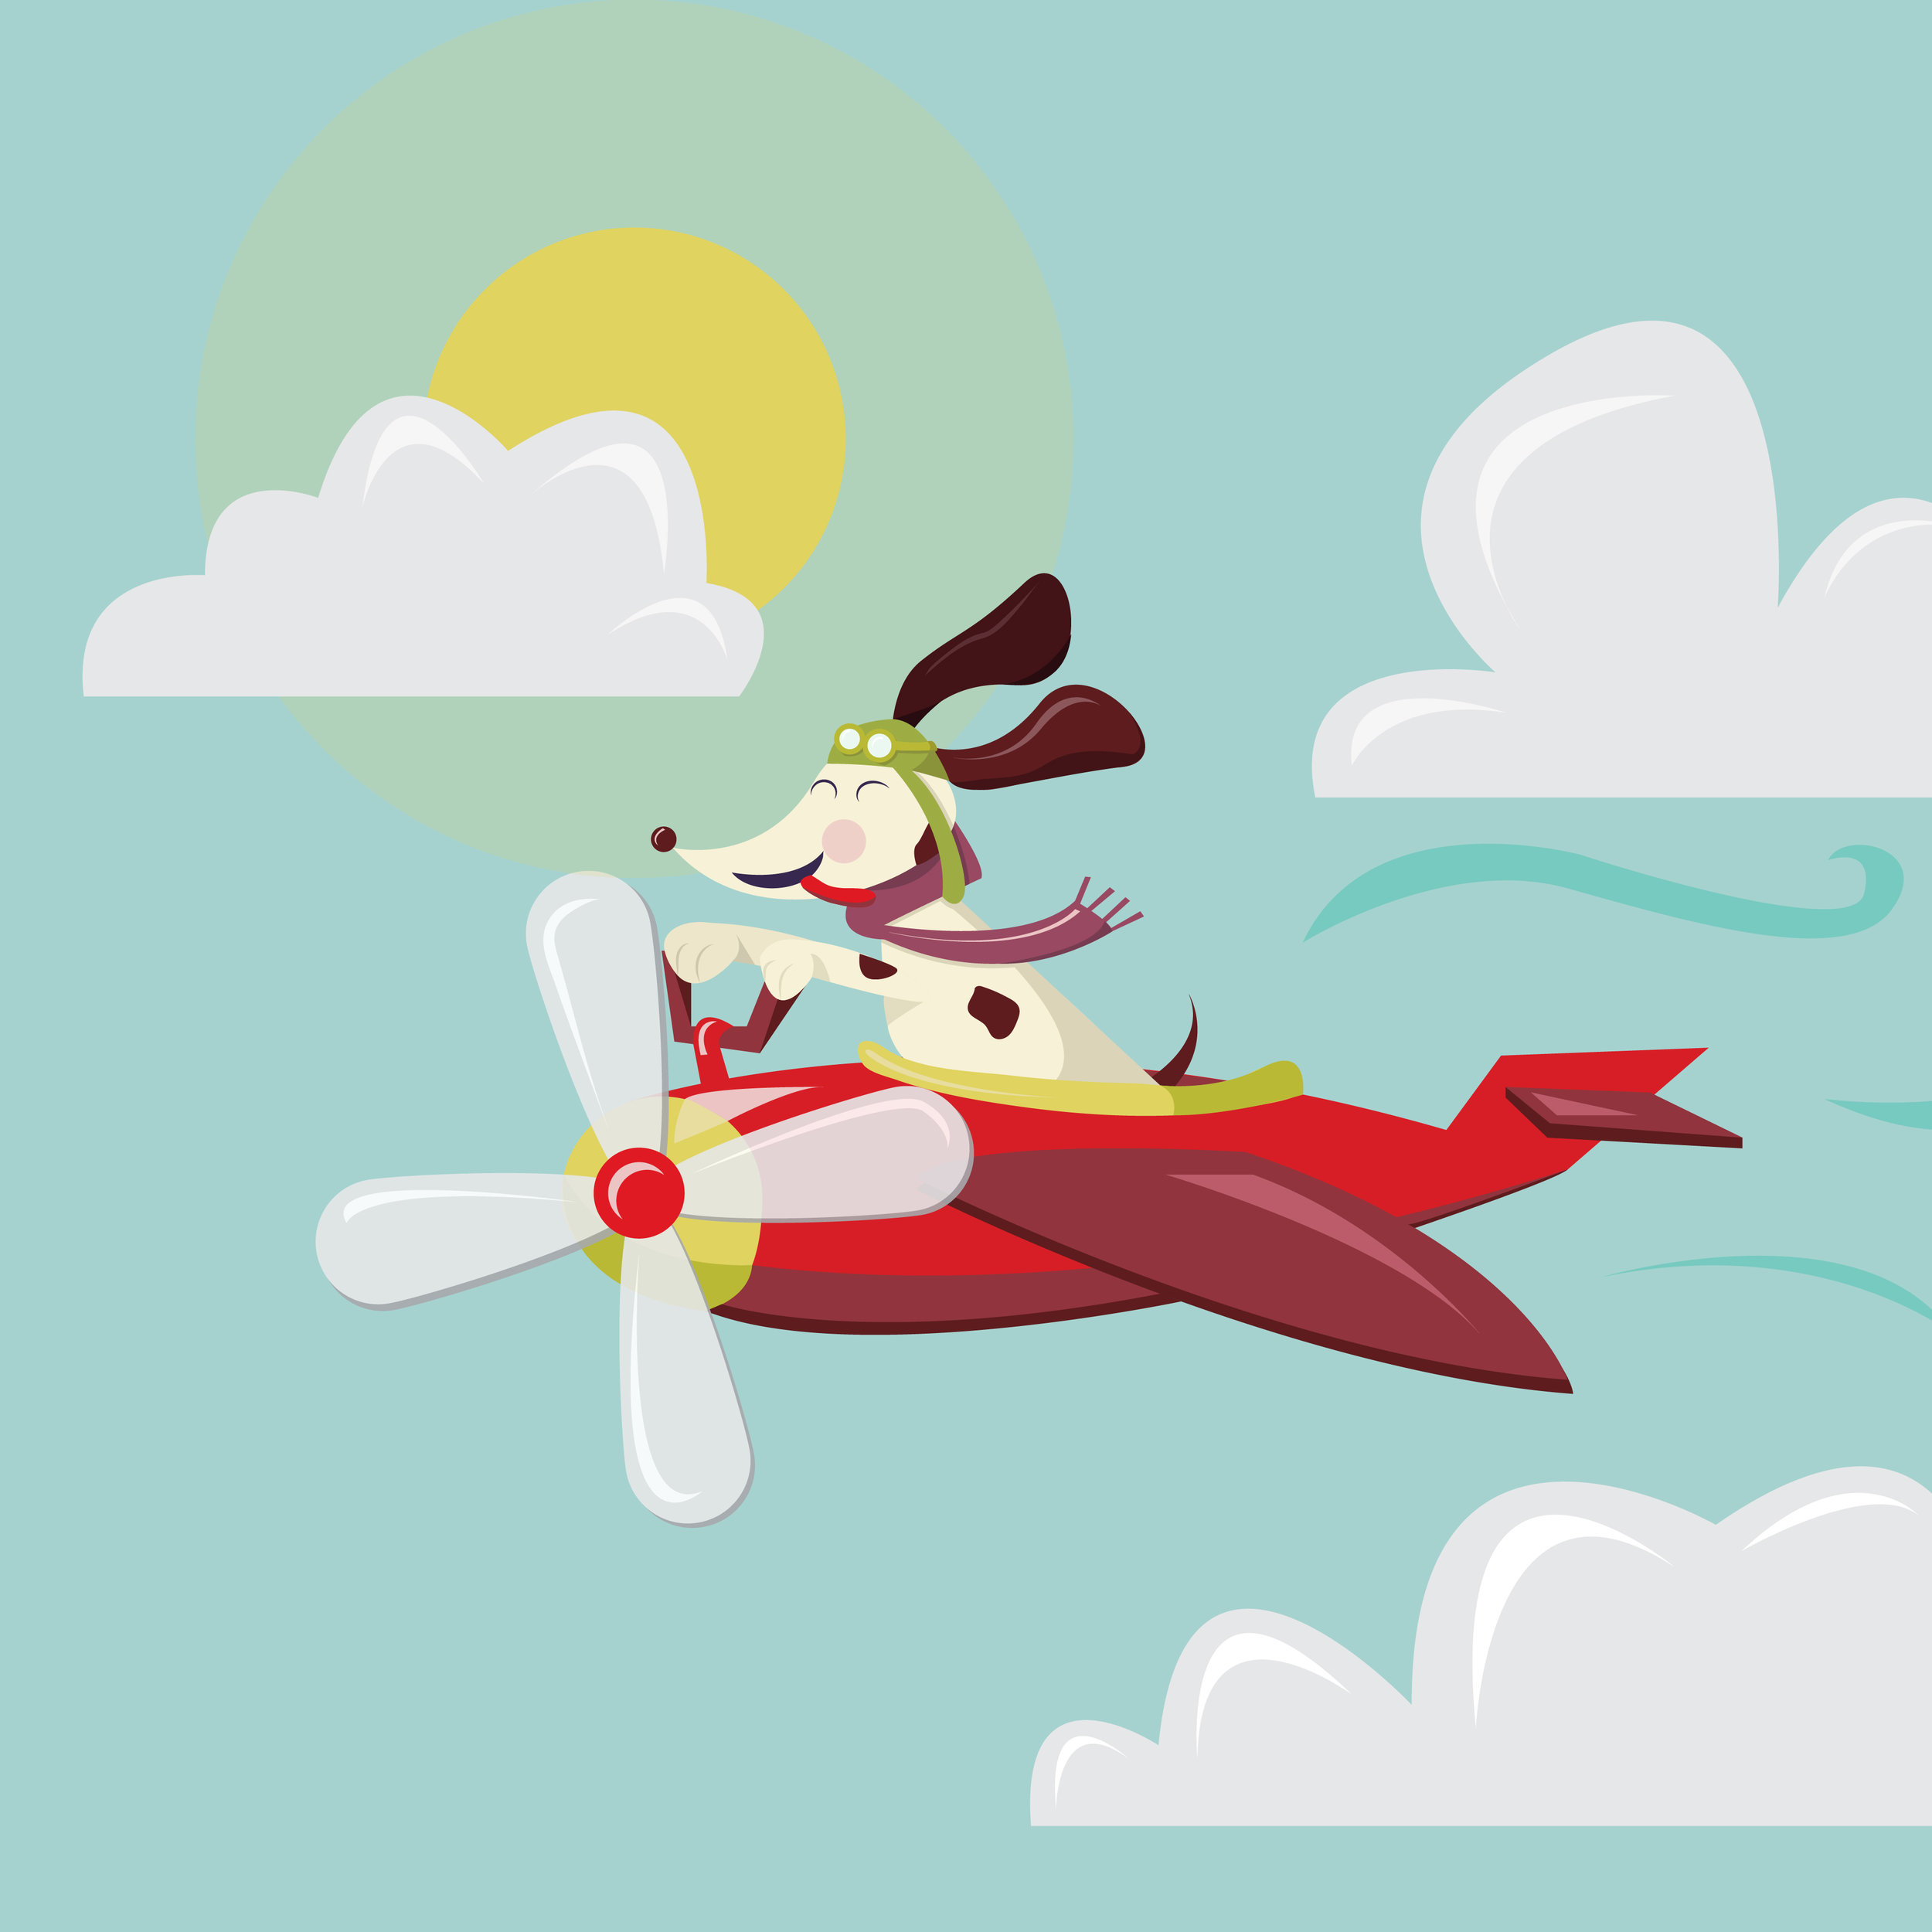 Dog Pilot No Texture-01.jpg